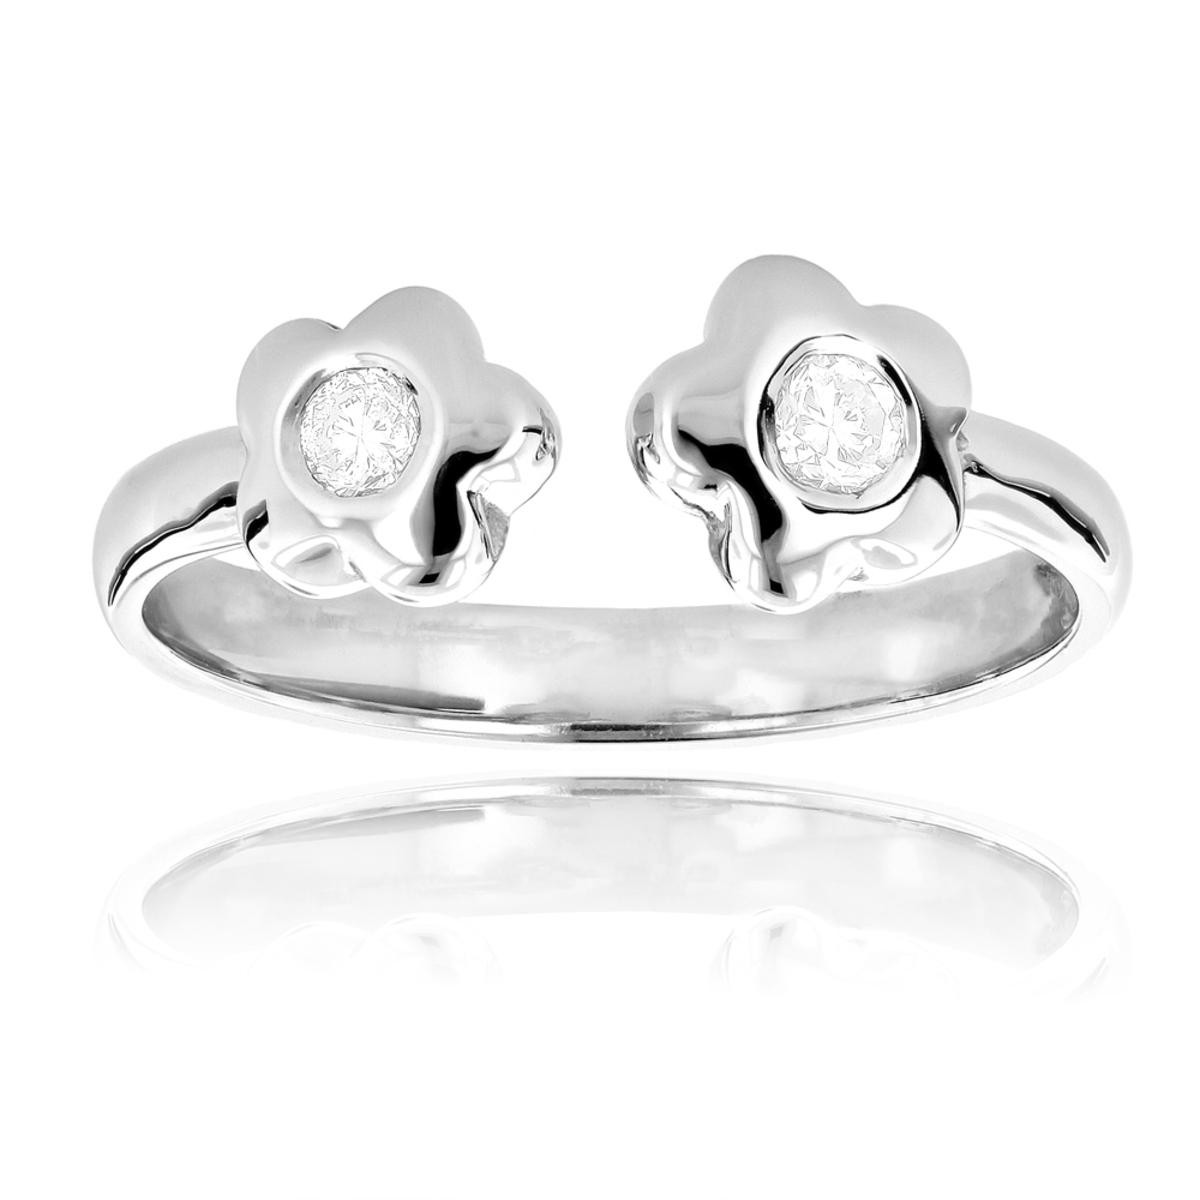 Adjustable 14K Gold Diamond Toe Ring Flower 0.07ct